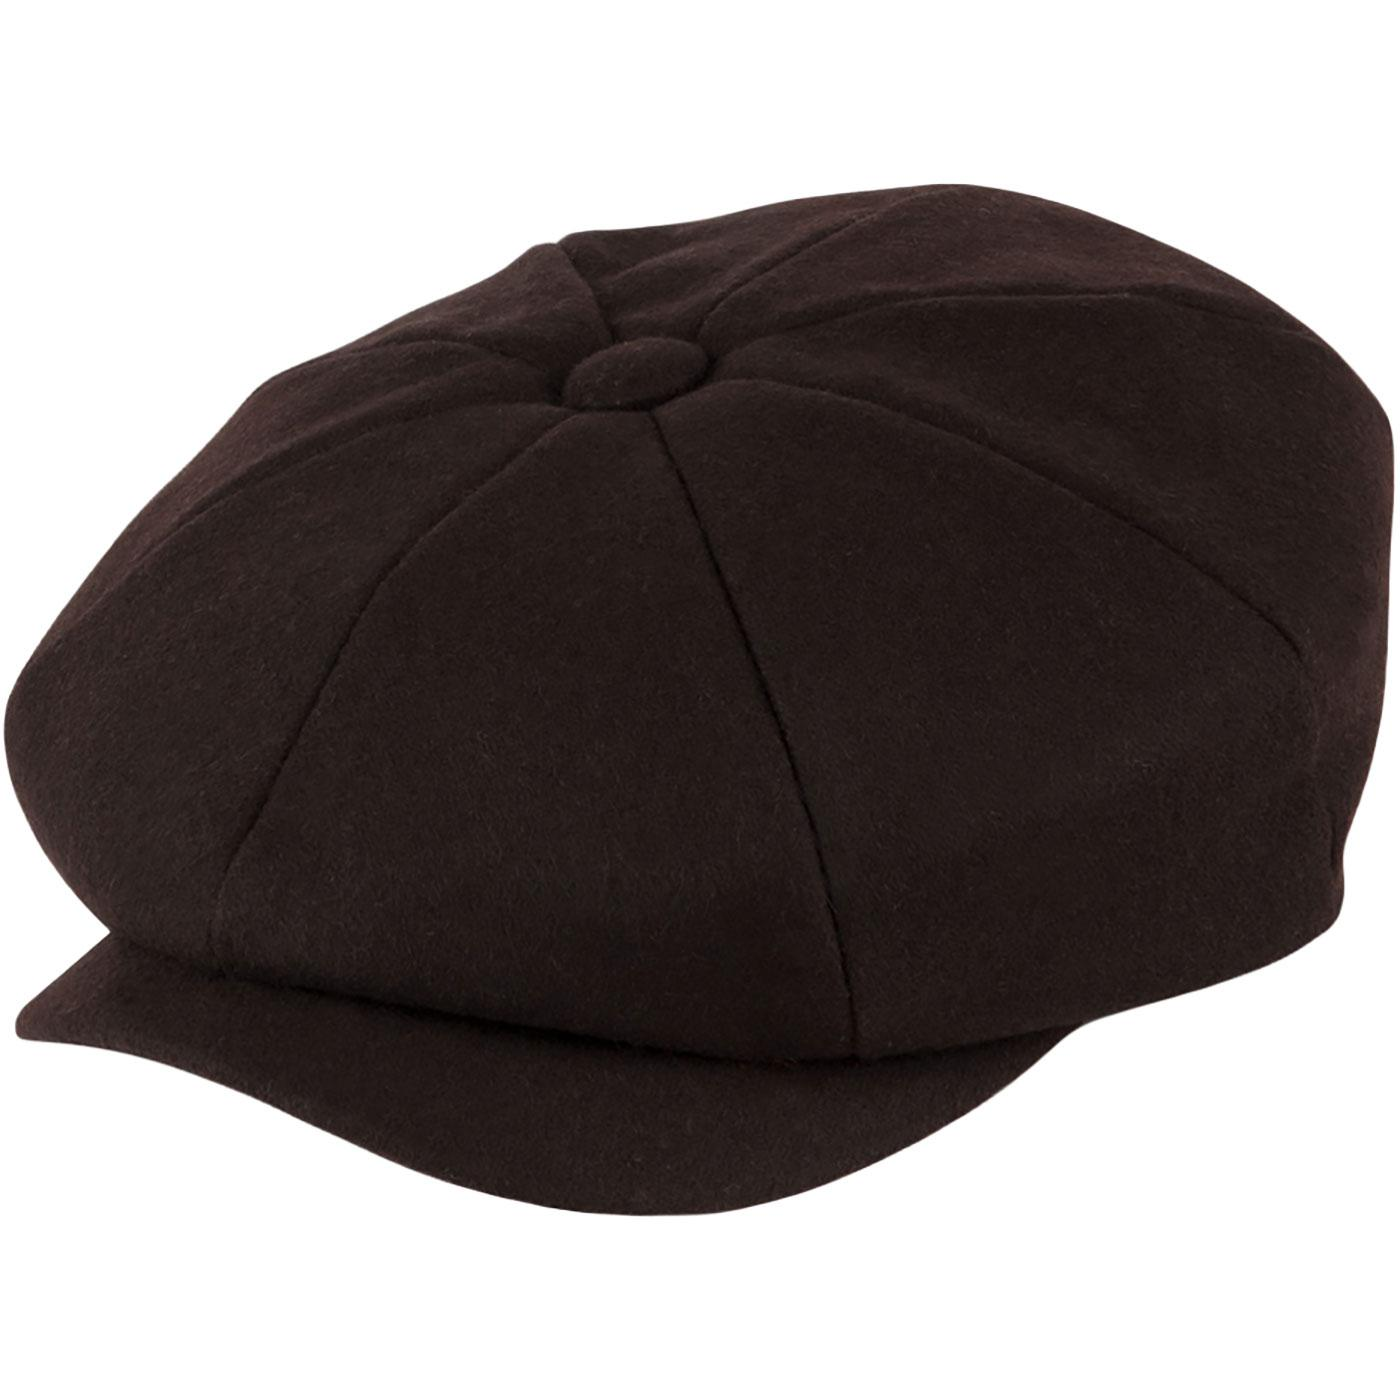 Alfie FAILSWORTH Retro Melton 8 Panel Gatsby Hat